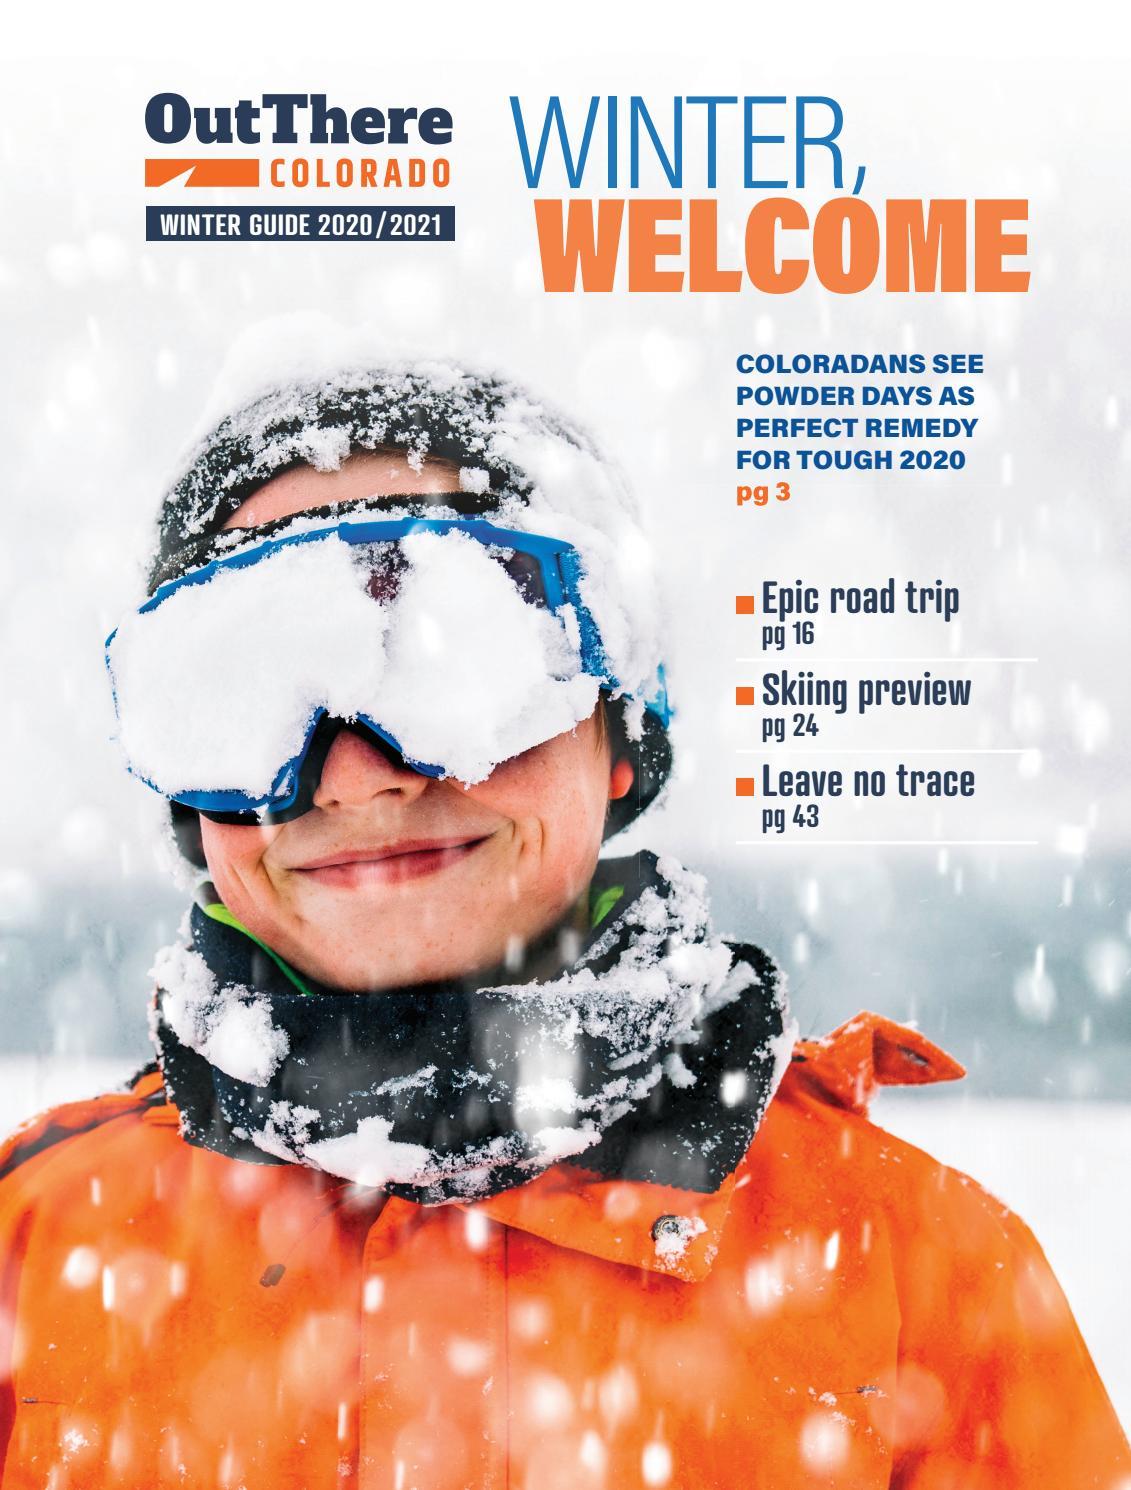 2020 21 Otc Winter Guide By Colorado Springs Gazette Llc Issuu